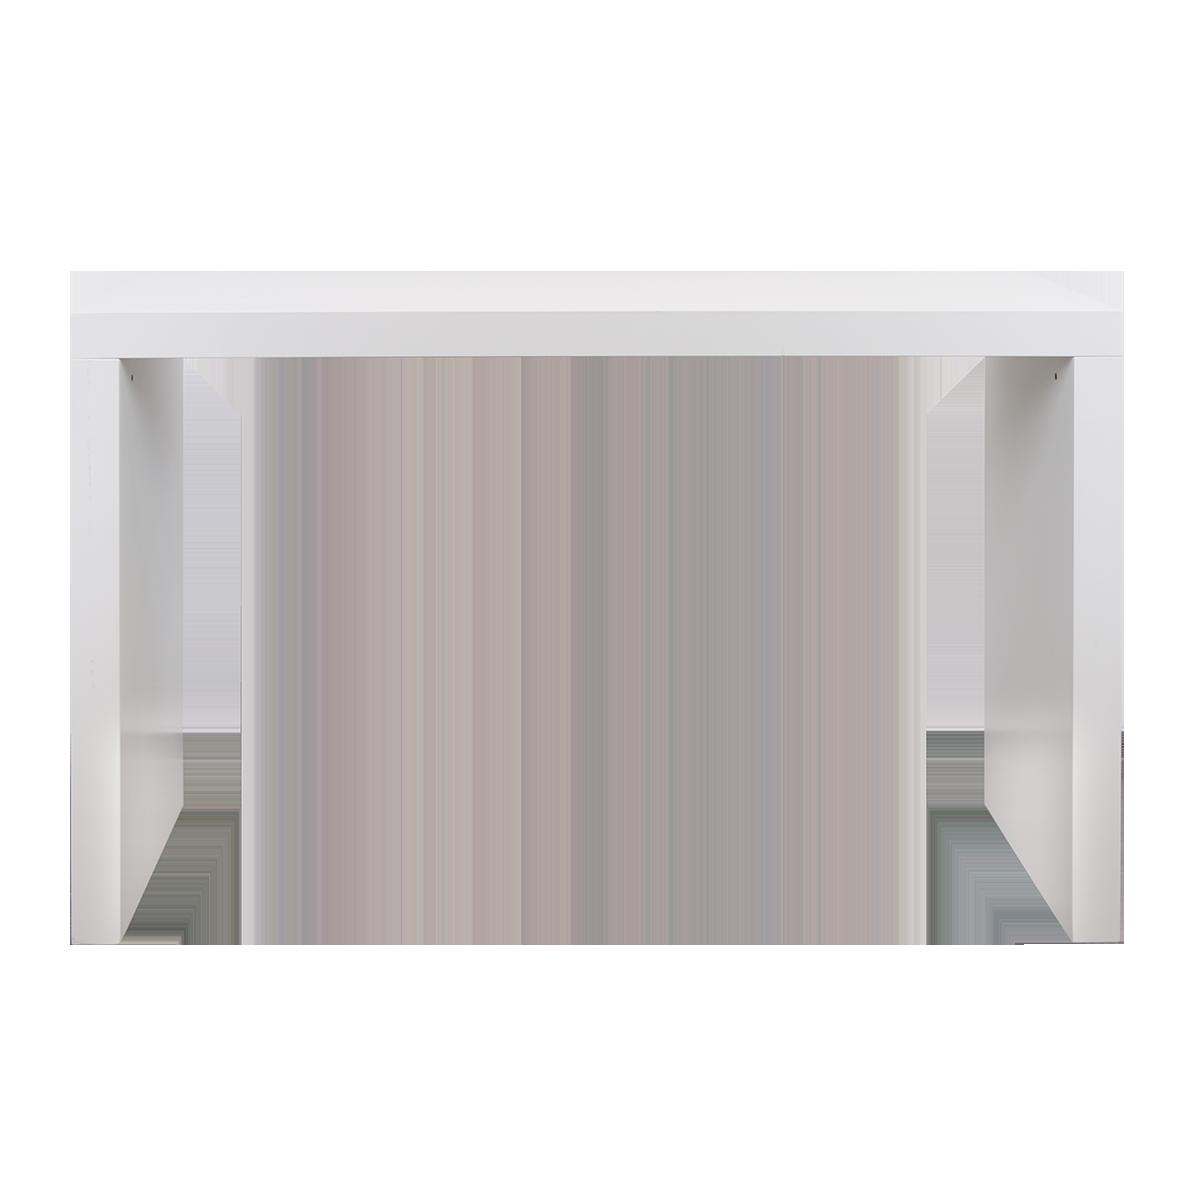 Stehbrücke, weiß, 180 x 60 cm